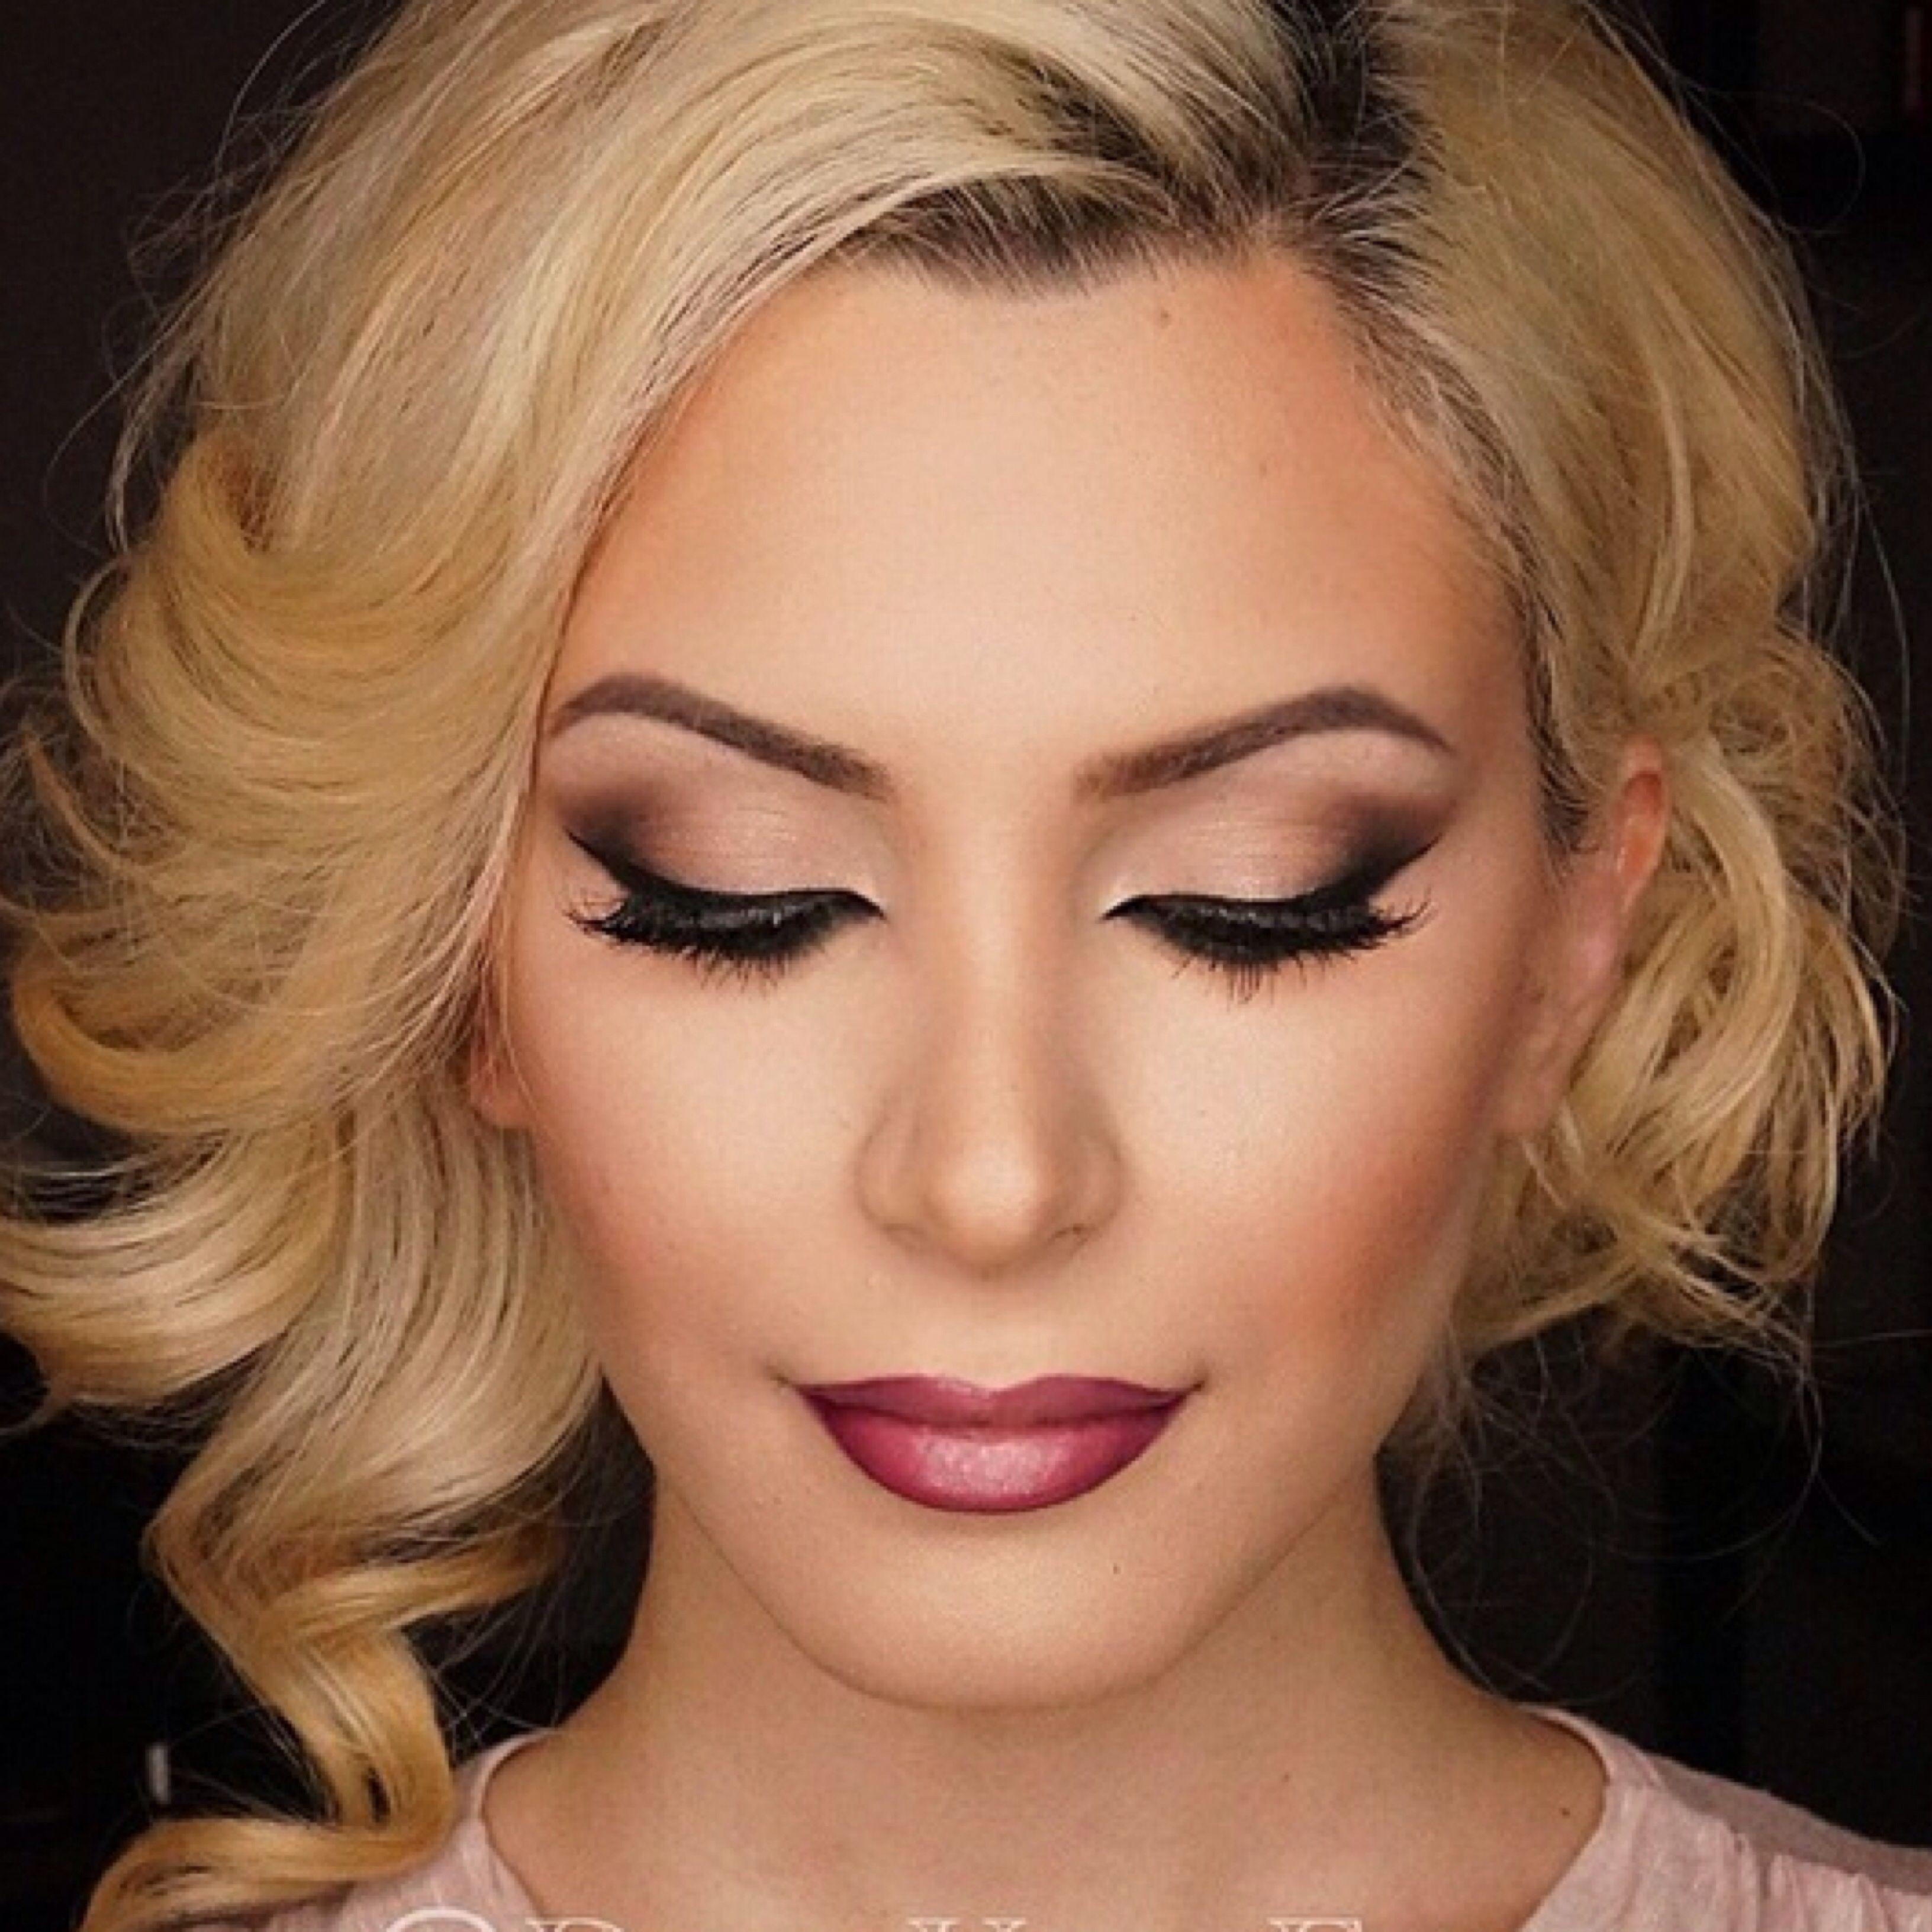 Cateye smokey shadow wedding fit4thedress hair makeup